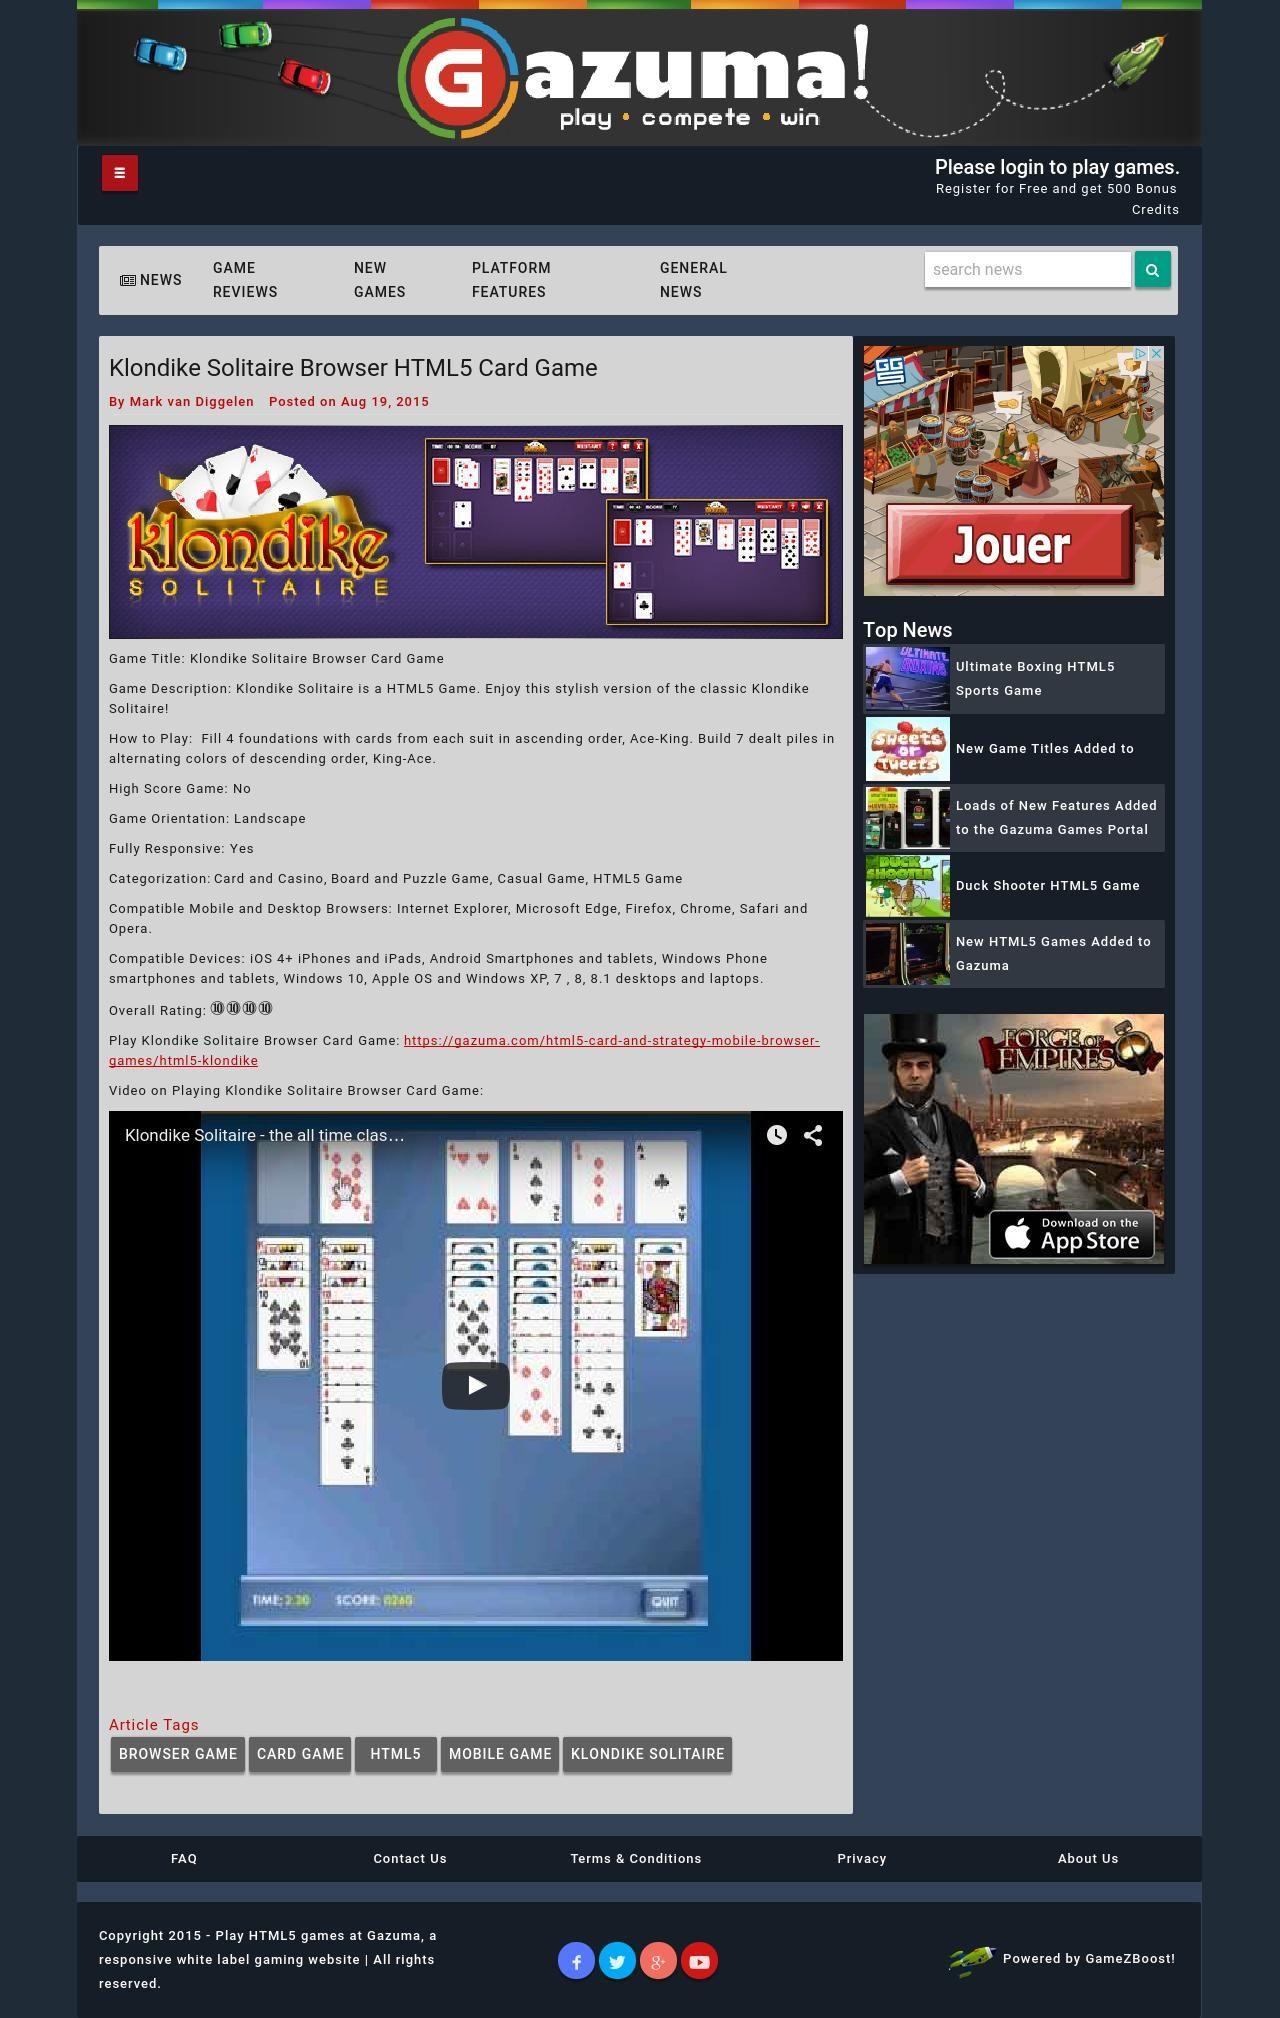 HTML5 gaming news publishing platform, news